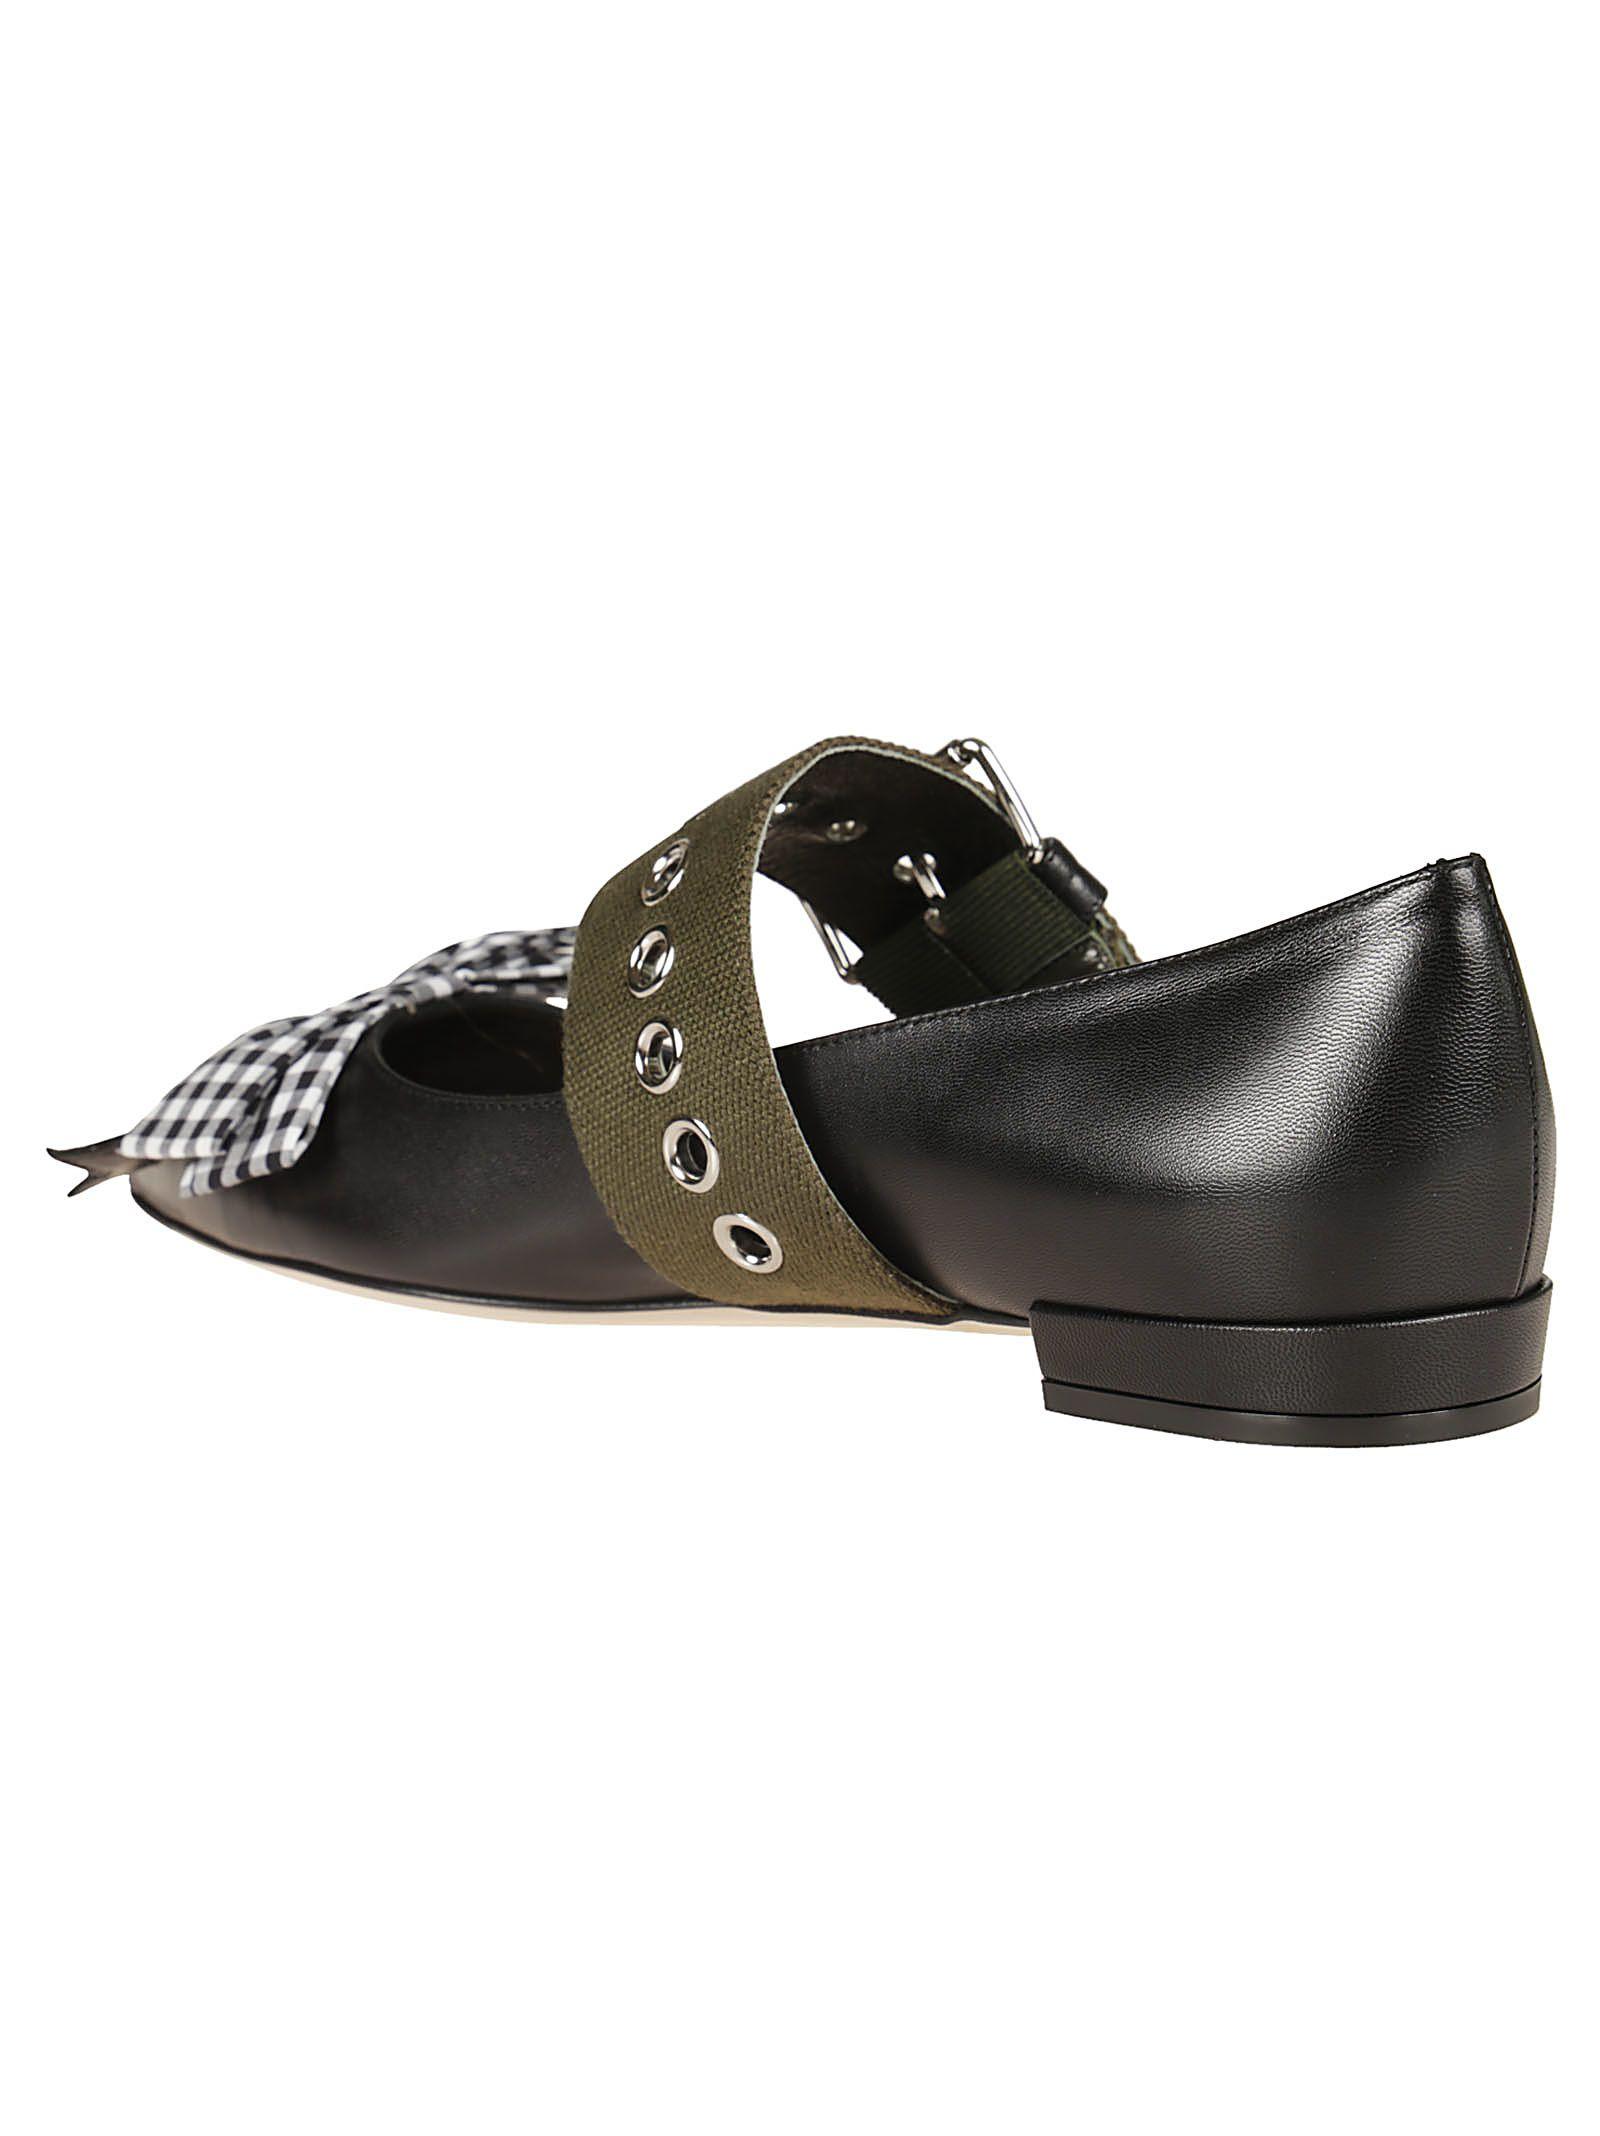 45384b856c0 ... Miu Miu Ankle Belt Strap Ballerinas - Black